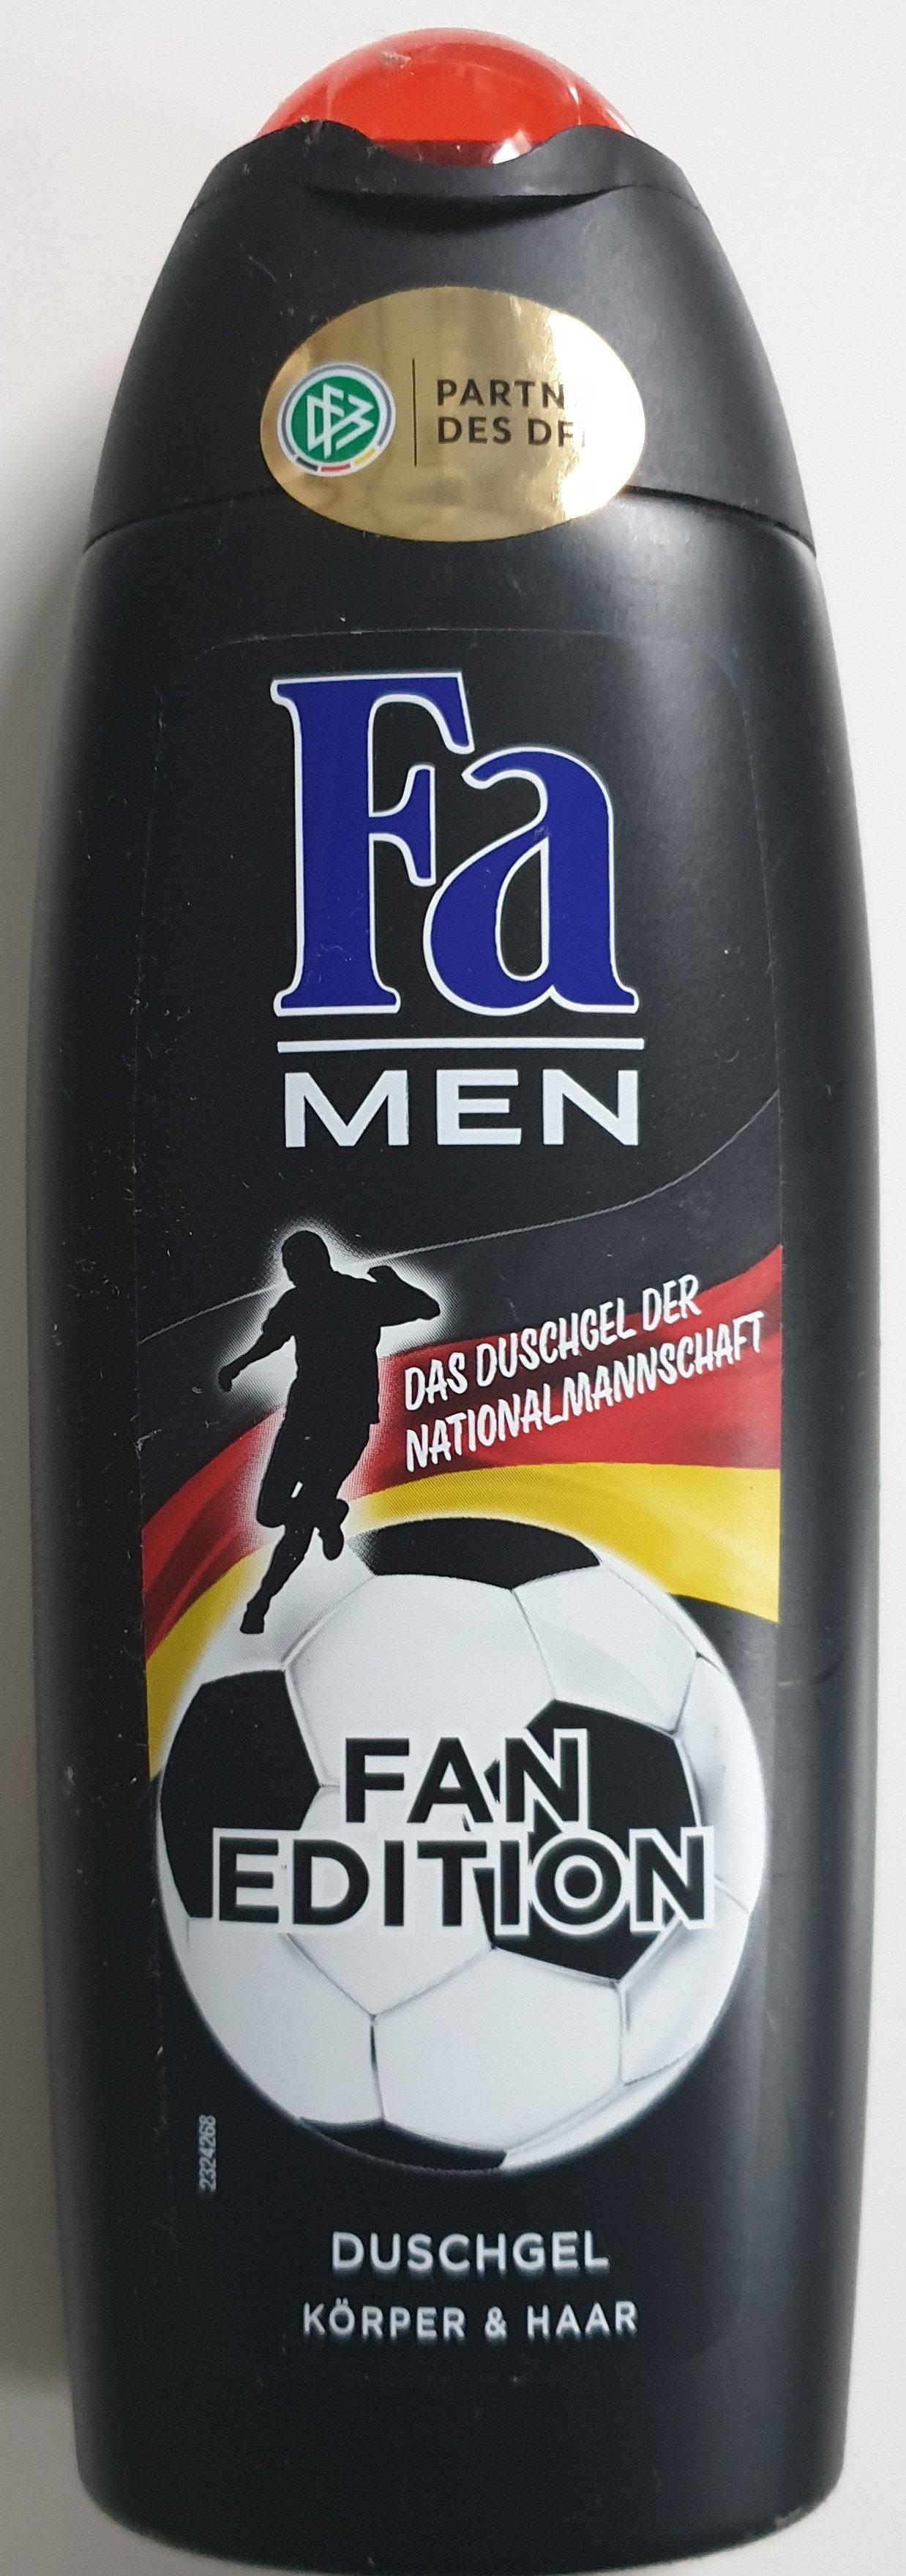 Duschgel Fan edition - Product